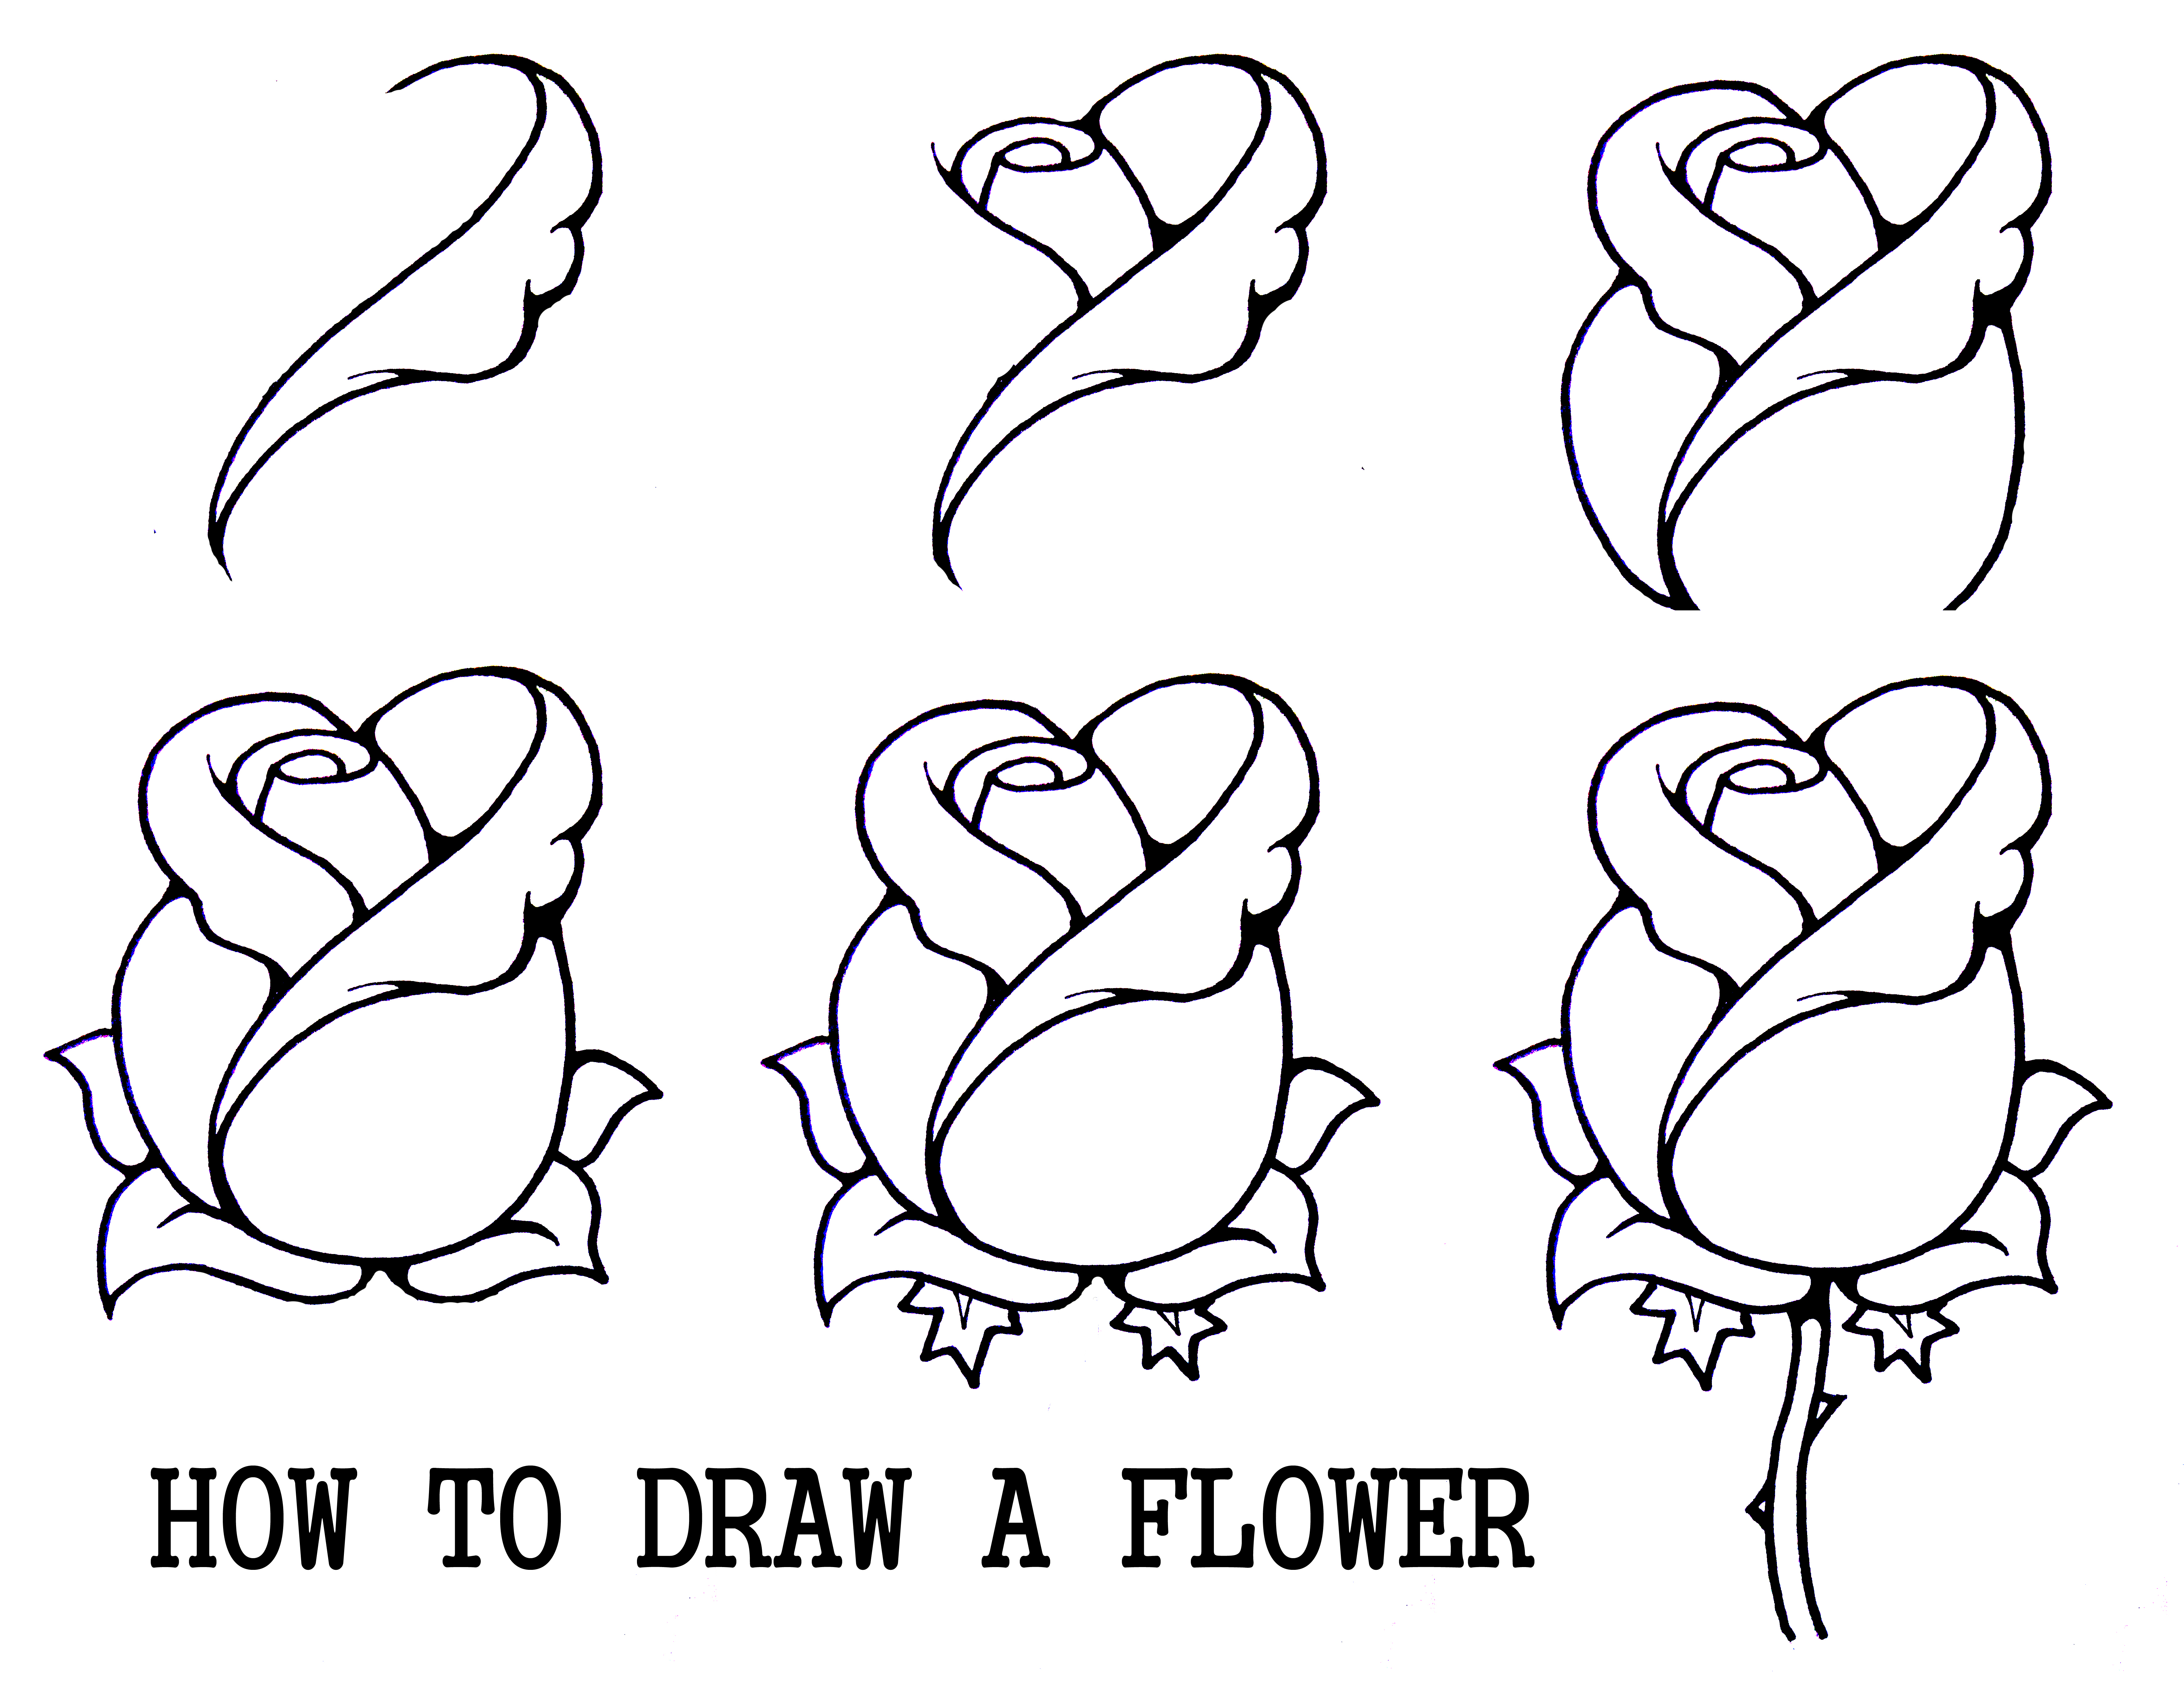 Flower drawings free download clip art Line drawings of flowers free download - ClipartFest clip art